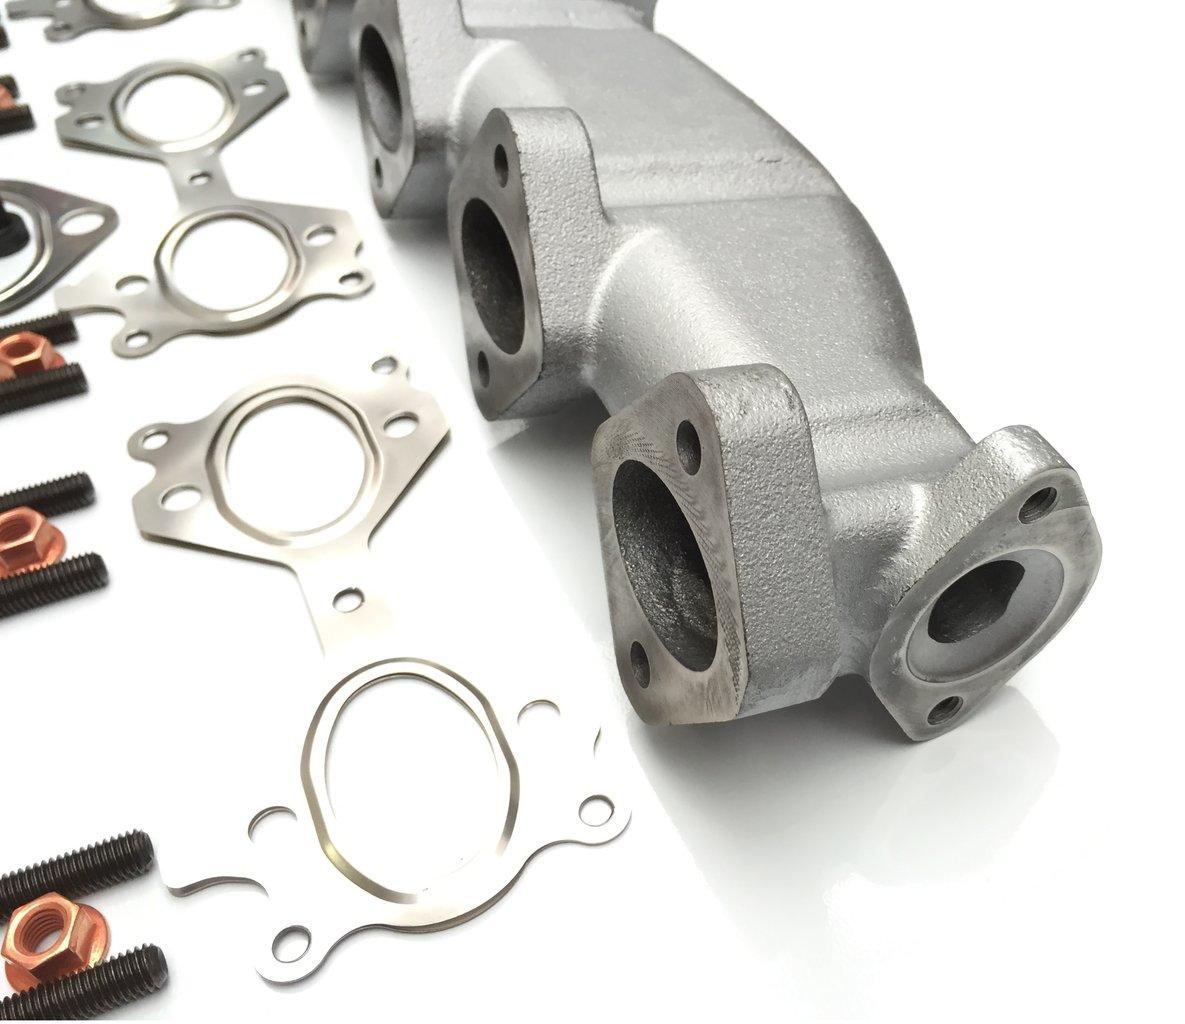 TAKPART Tubo de escape de hierro fundido con juntas compatible para BMW E46 E39 E60 E61 E38 E65 E83 E53 3 5 7 X3 X5